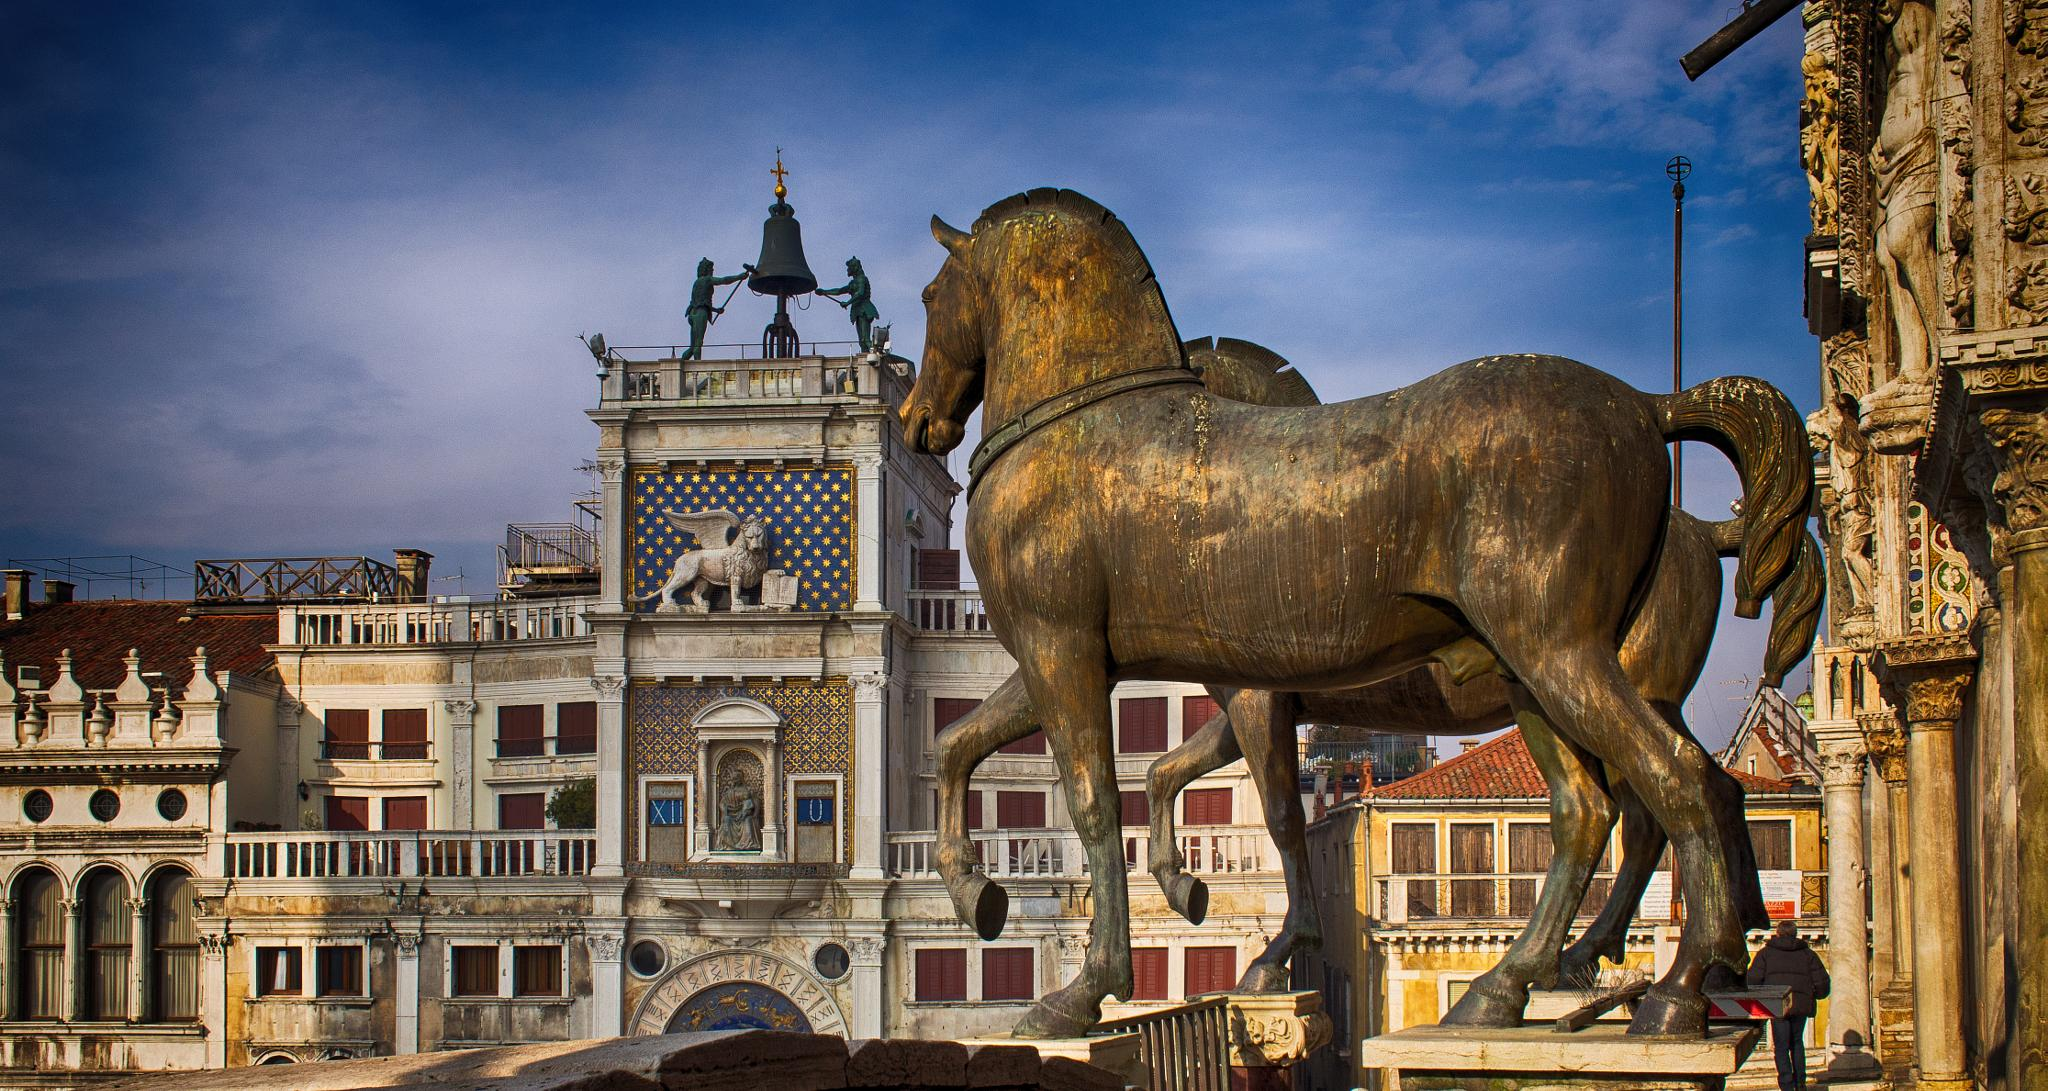 P. San Marco by jozseftoth